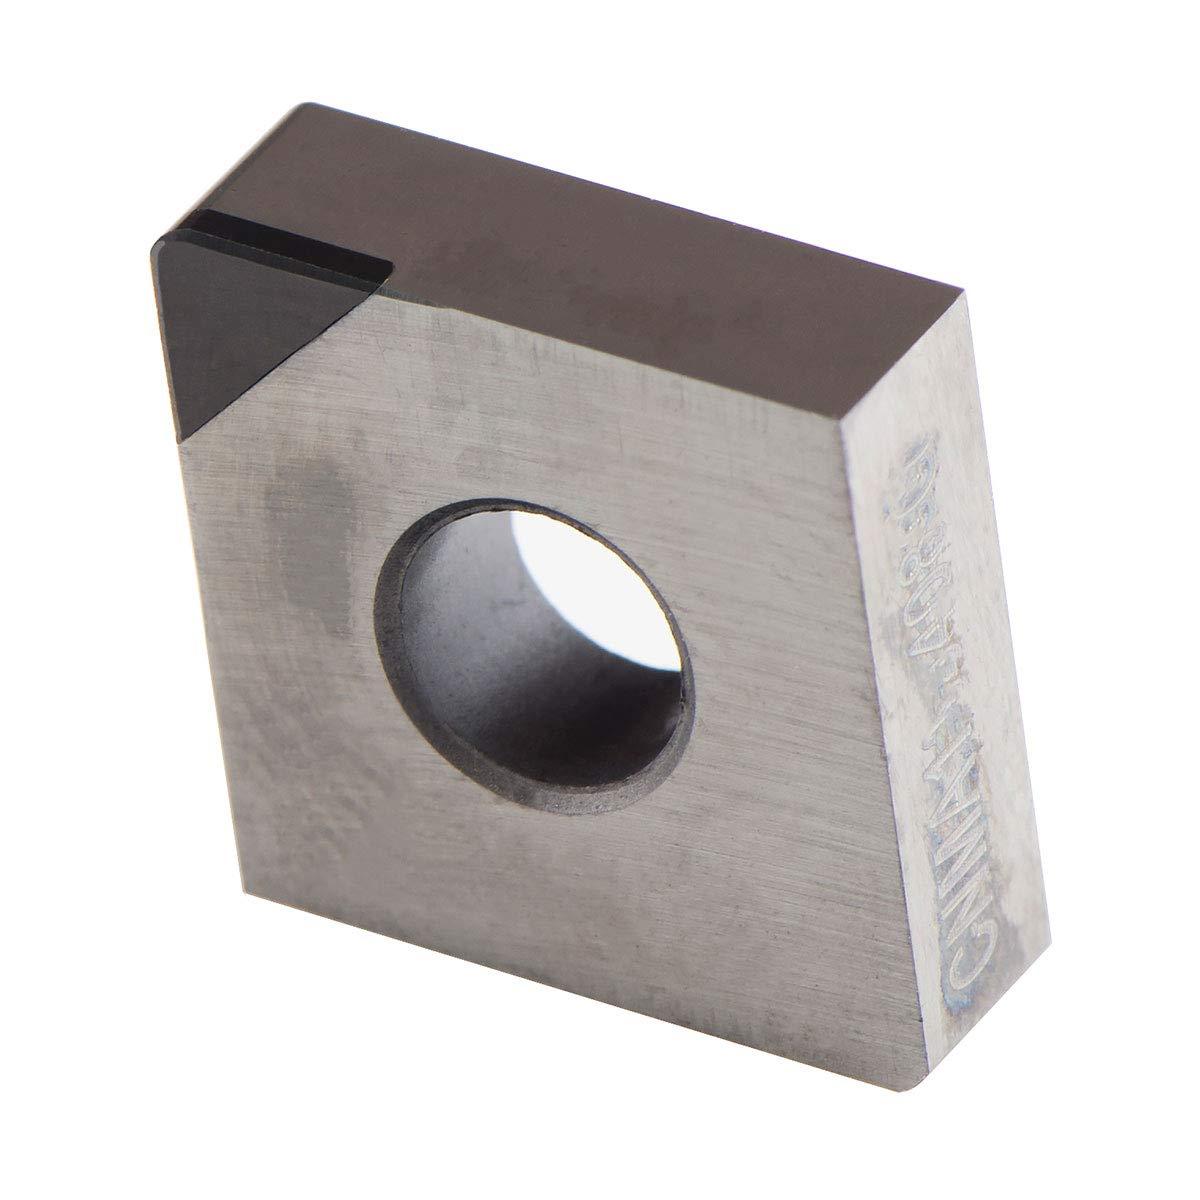 MAXTOOL 2PCs CNMA432-G82P2 PCBN Tipped Inserts Polycrystalline Cubic Boron Nitride Grade 8200 CNMA120408